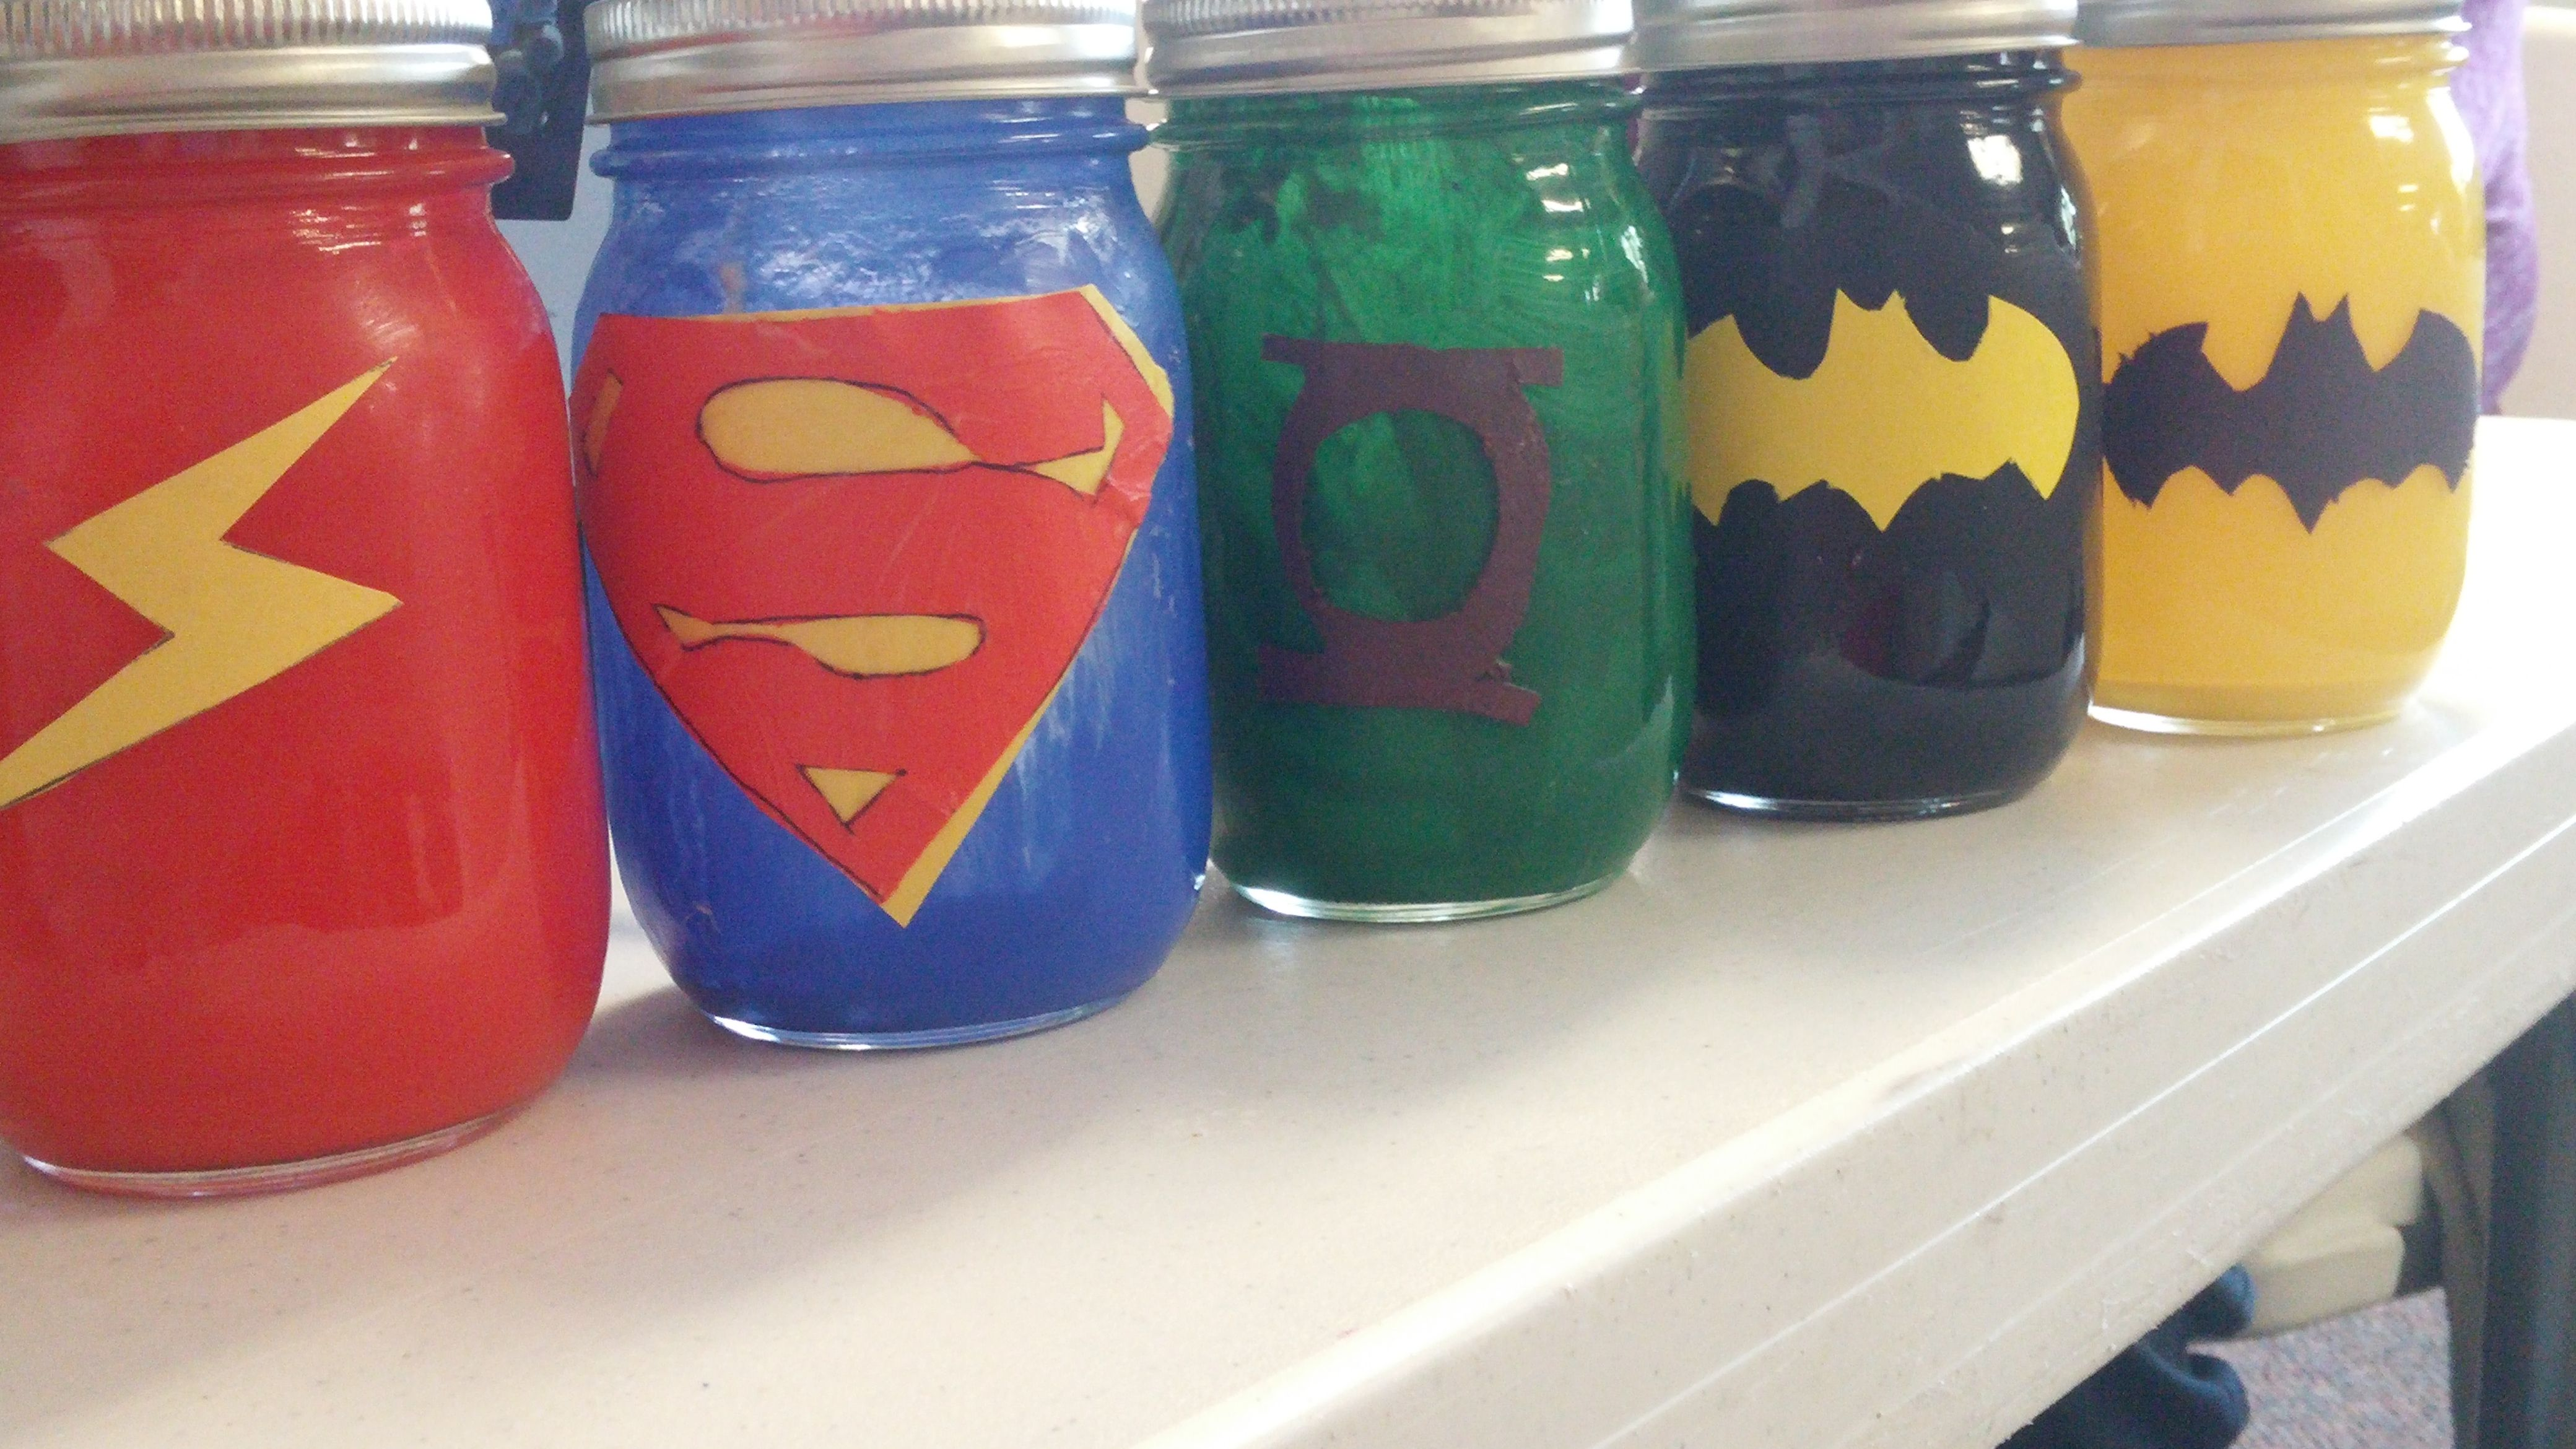 Diy Mason Jar Superhero Banks Made With Acrylic Paint On